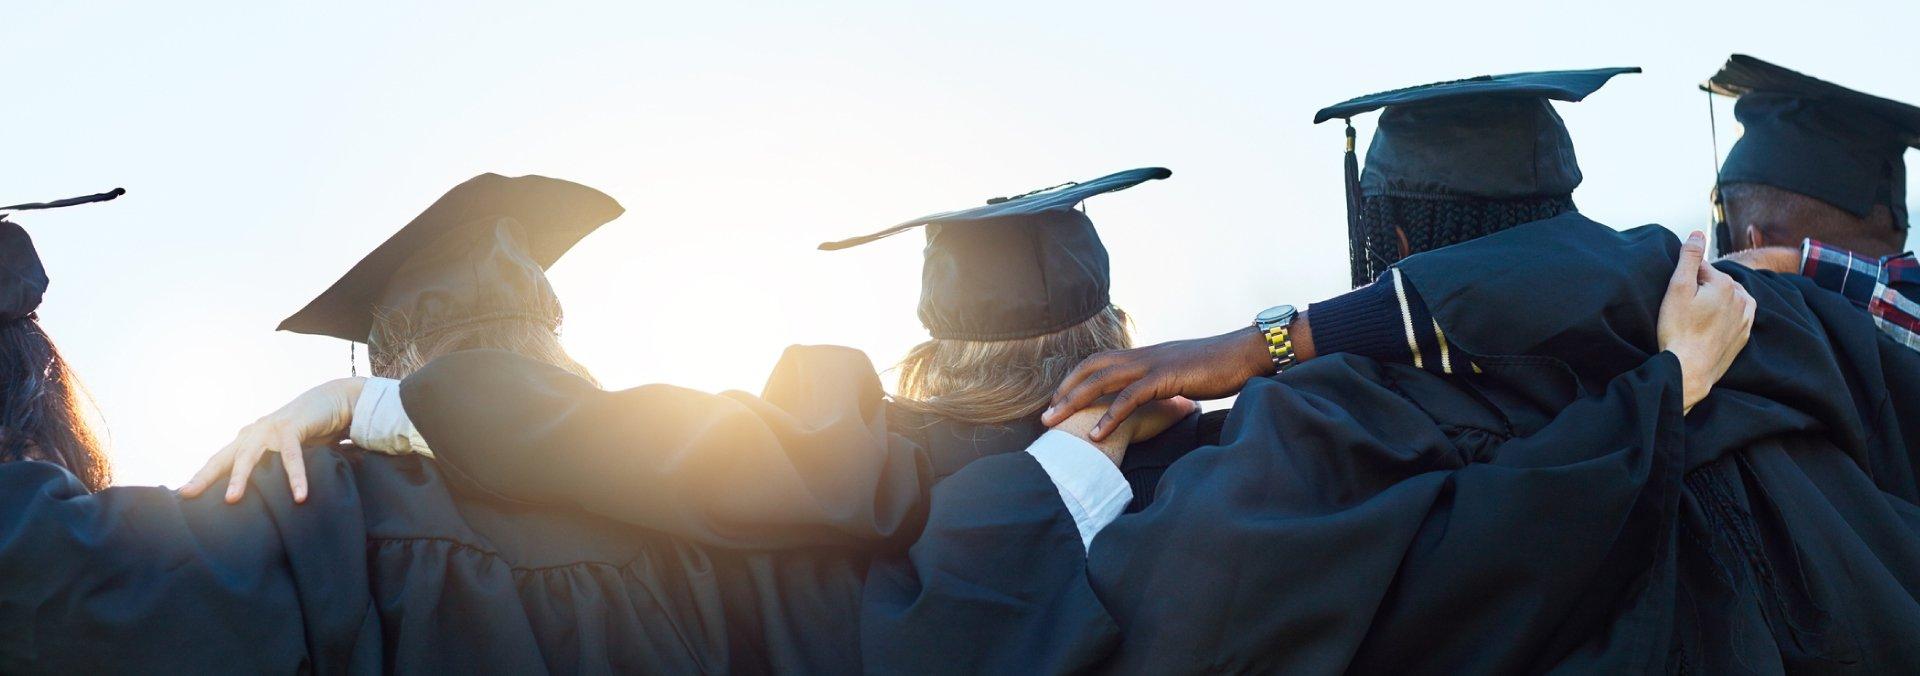 Graduates Posing For Photo